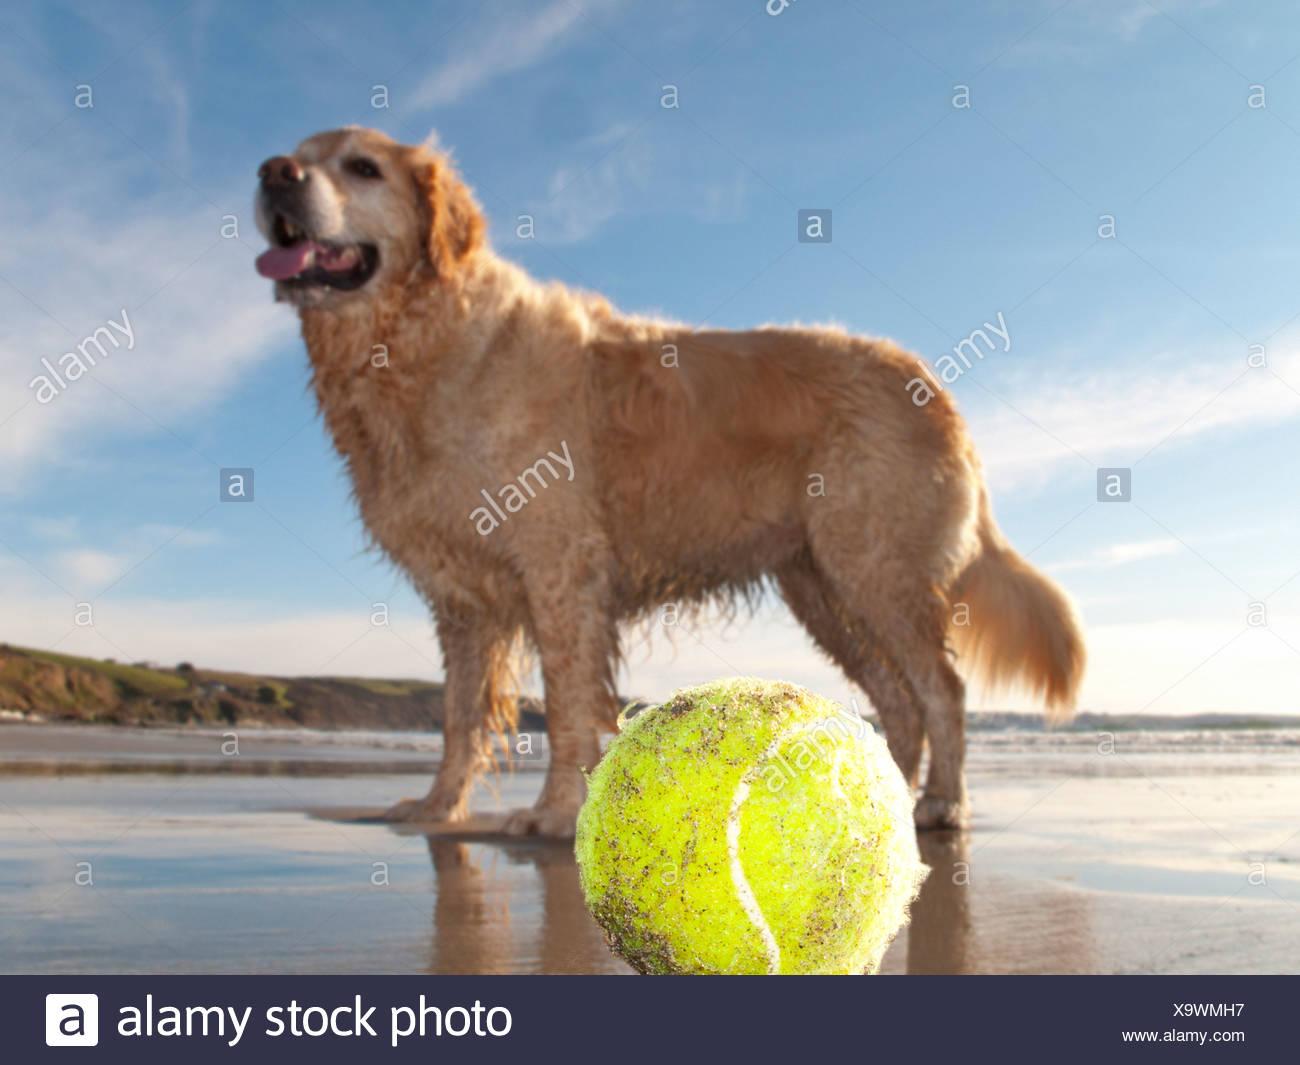 Dog enjoying beach and tennis ball at Gerrans Bay, Cornwall, United Kingdom - Stock Image